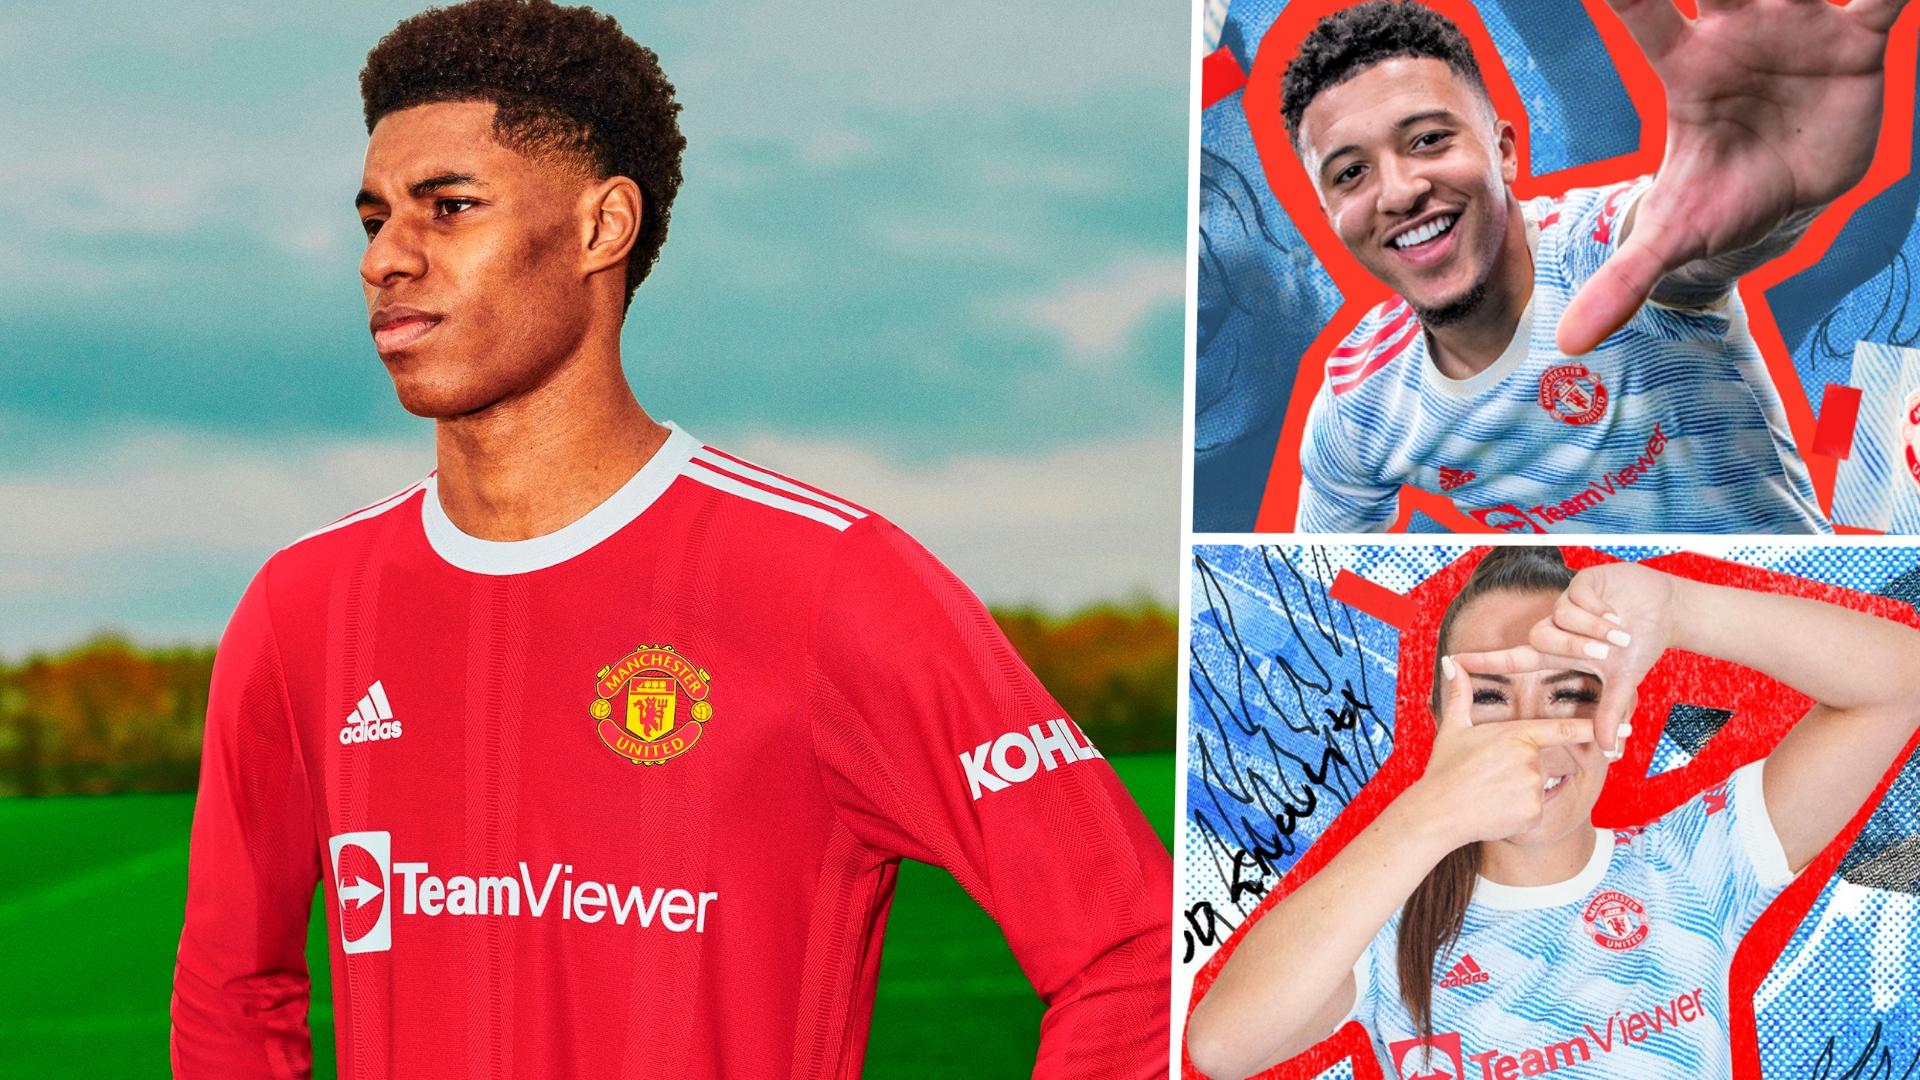 Man Utd 2021 22 Kit New Home Away Third Jersey Styles Plus Release Dates Goal Com